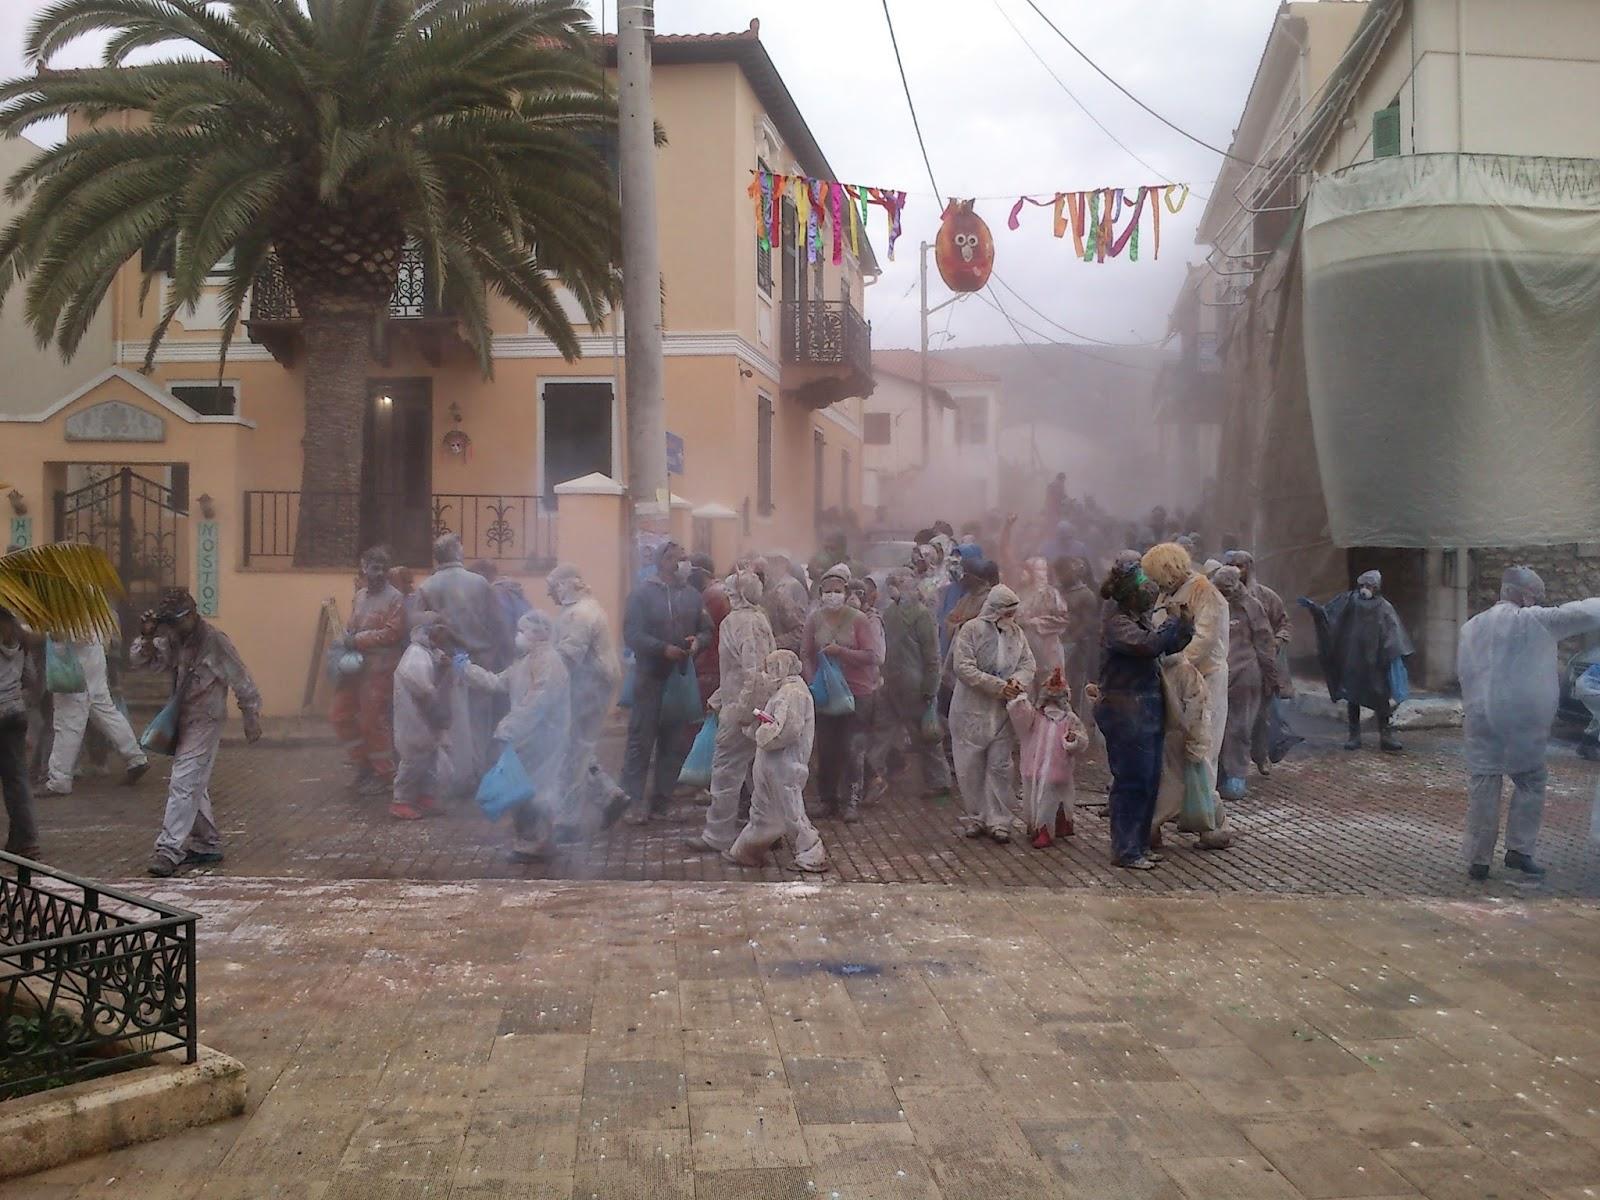 2015 Carnival parade in Galaxidi